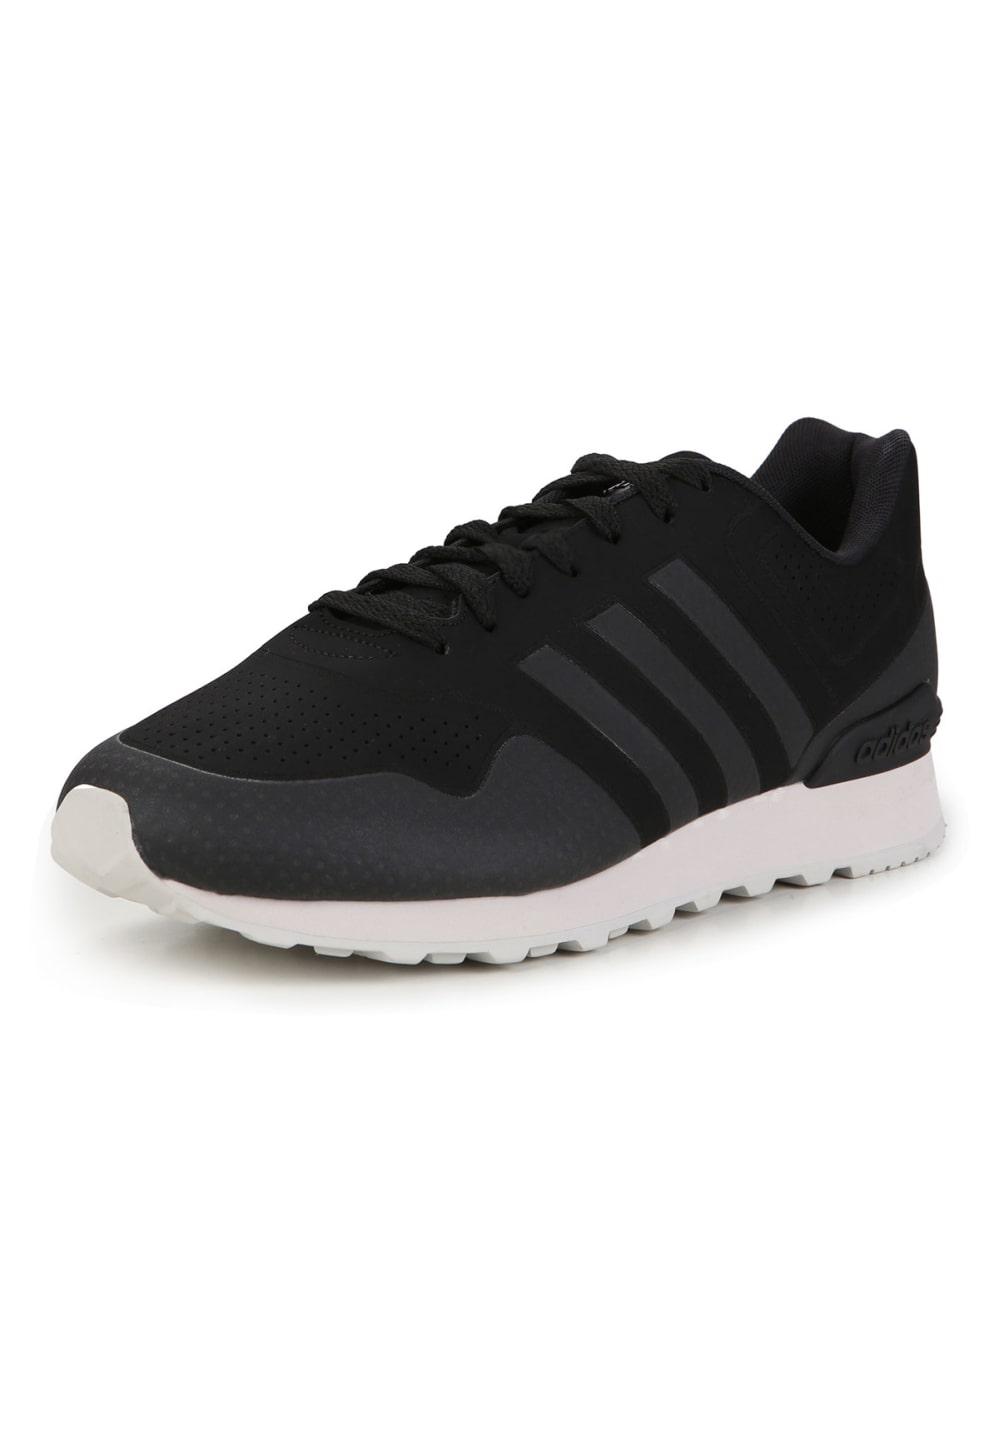 brand new 0b0e2 f9479 Next. -60%. adidas. 10K Casual Sneaker - Sneaker für Herren